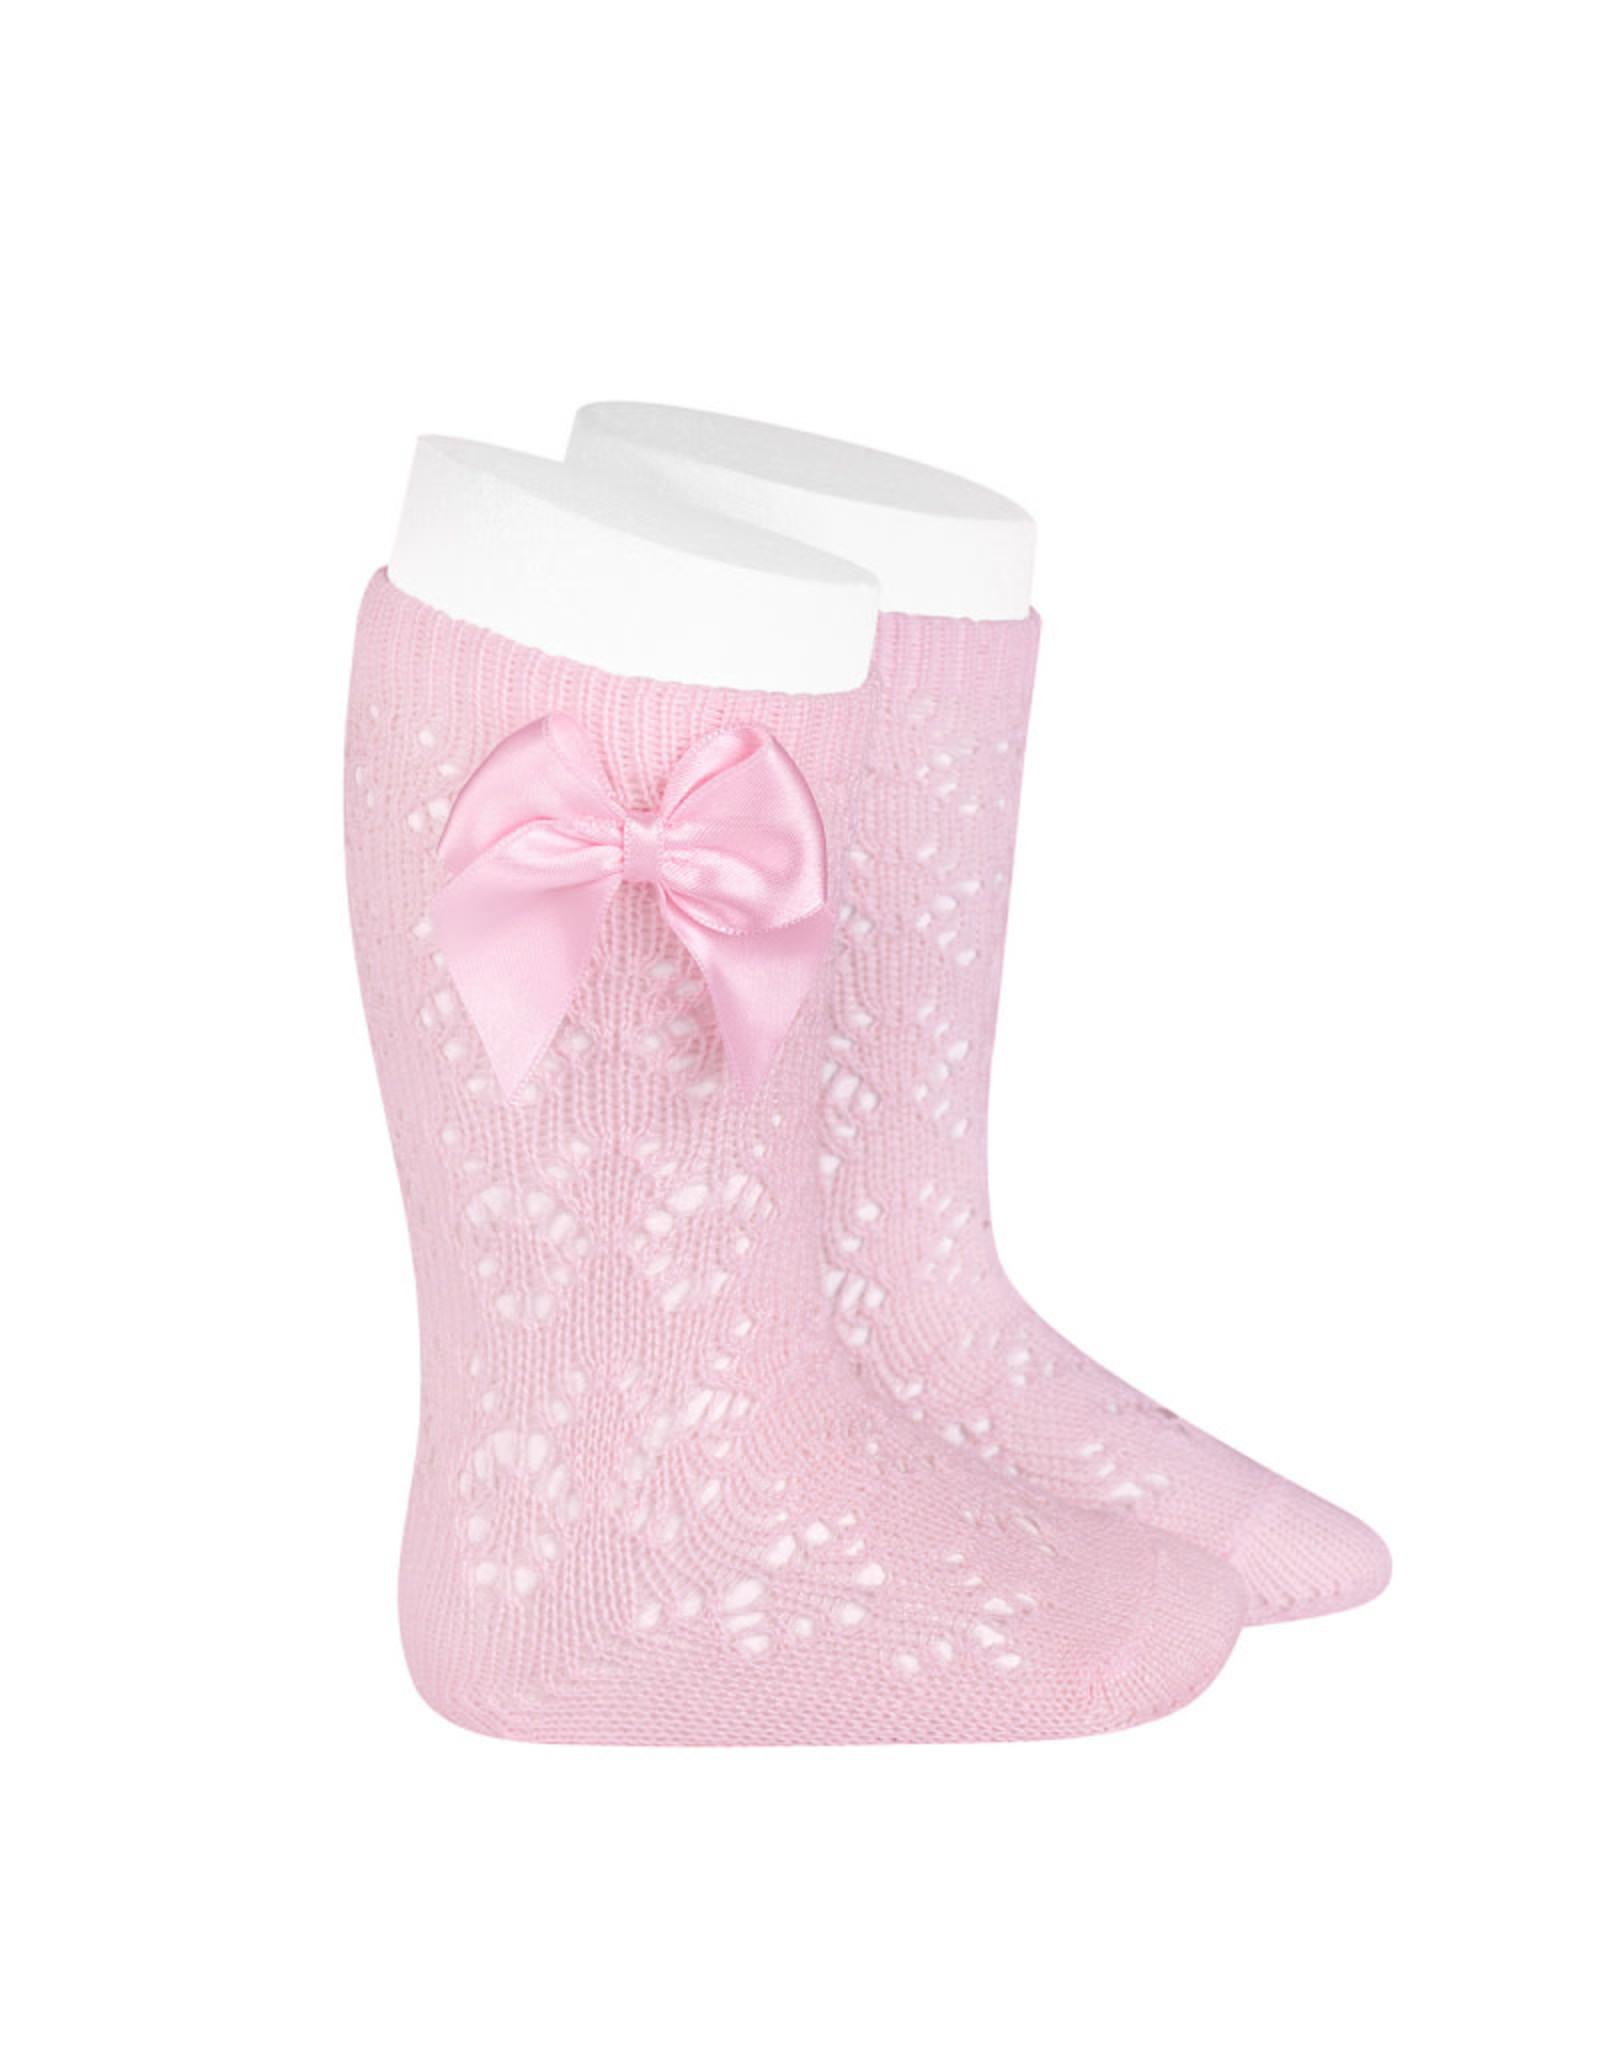 CONDOR Pink Geometric Socks with Bow